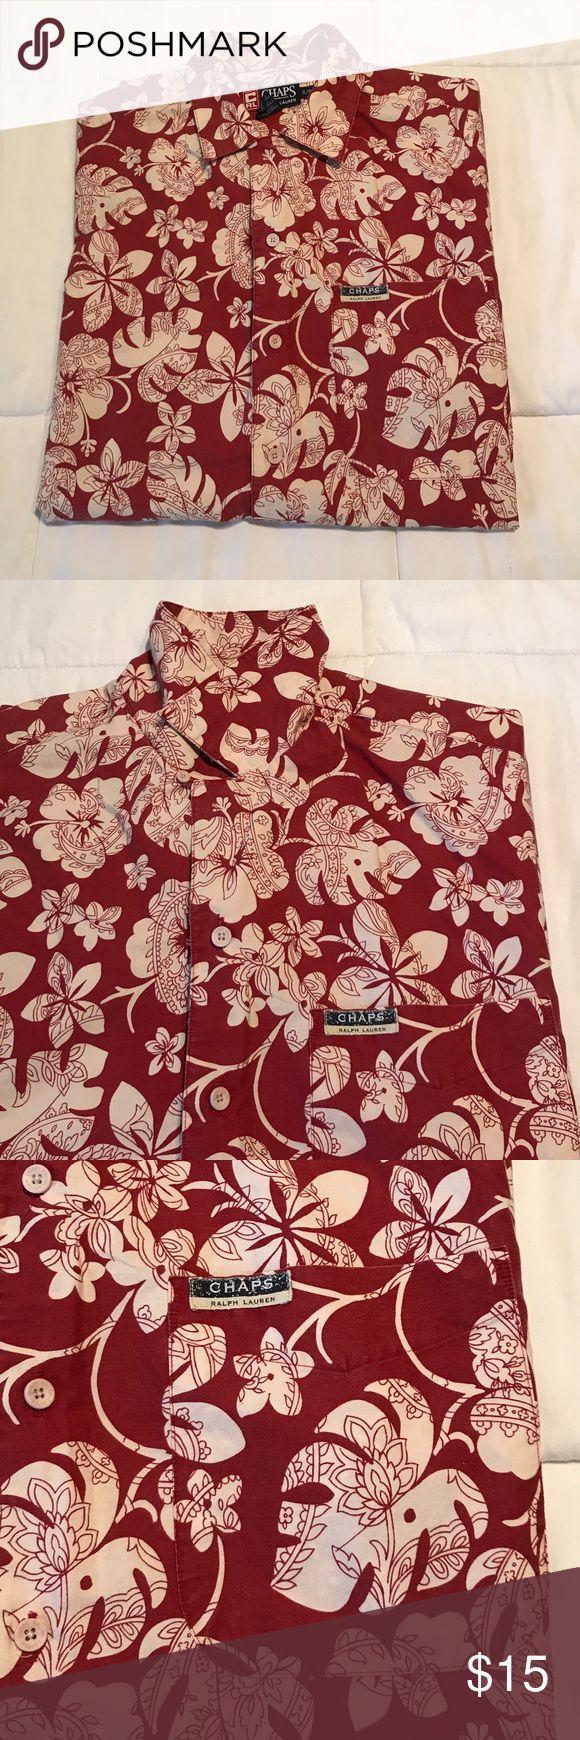 Chaps Ralph Lauren men's shirt Chaps Ralph Lauren men's shirt. EUC. Size S. Chaps Ralph Lauren Shirts Casual Button Down Shirts